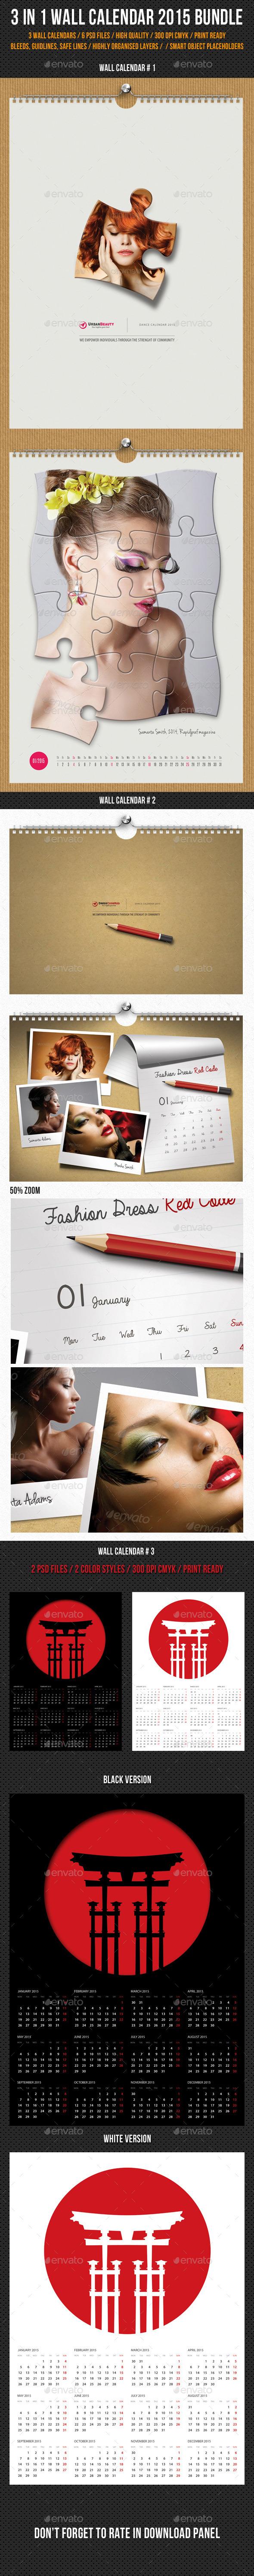 GraphicRiver 3 in 1 Wall Calendar 2015 Bundle V11 9989814